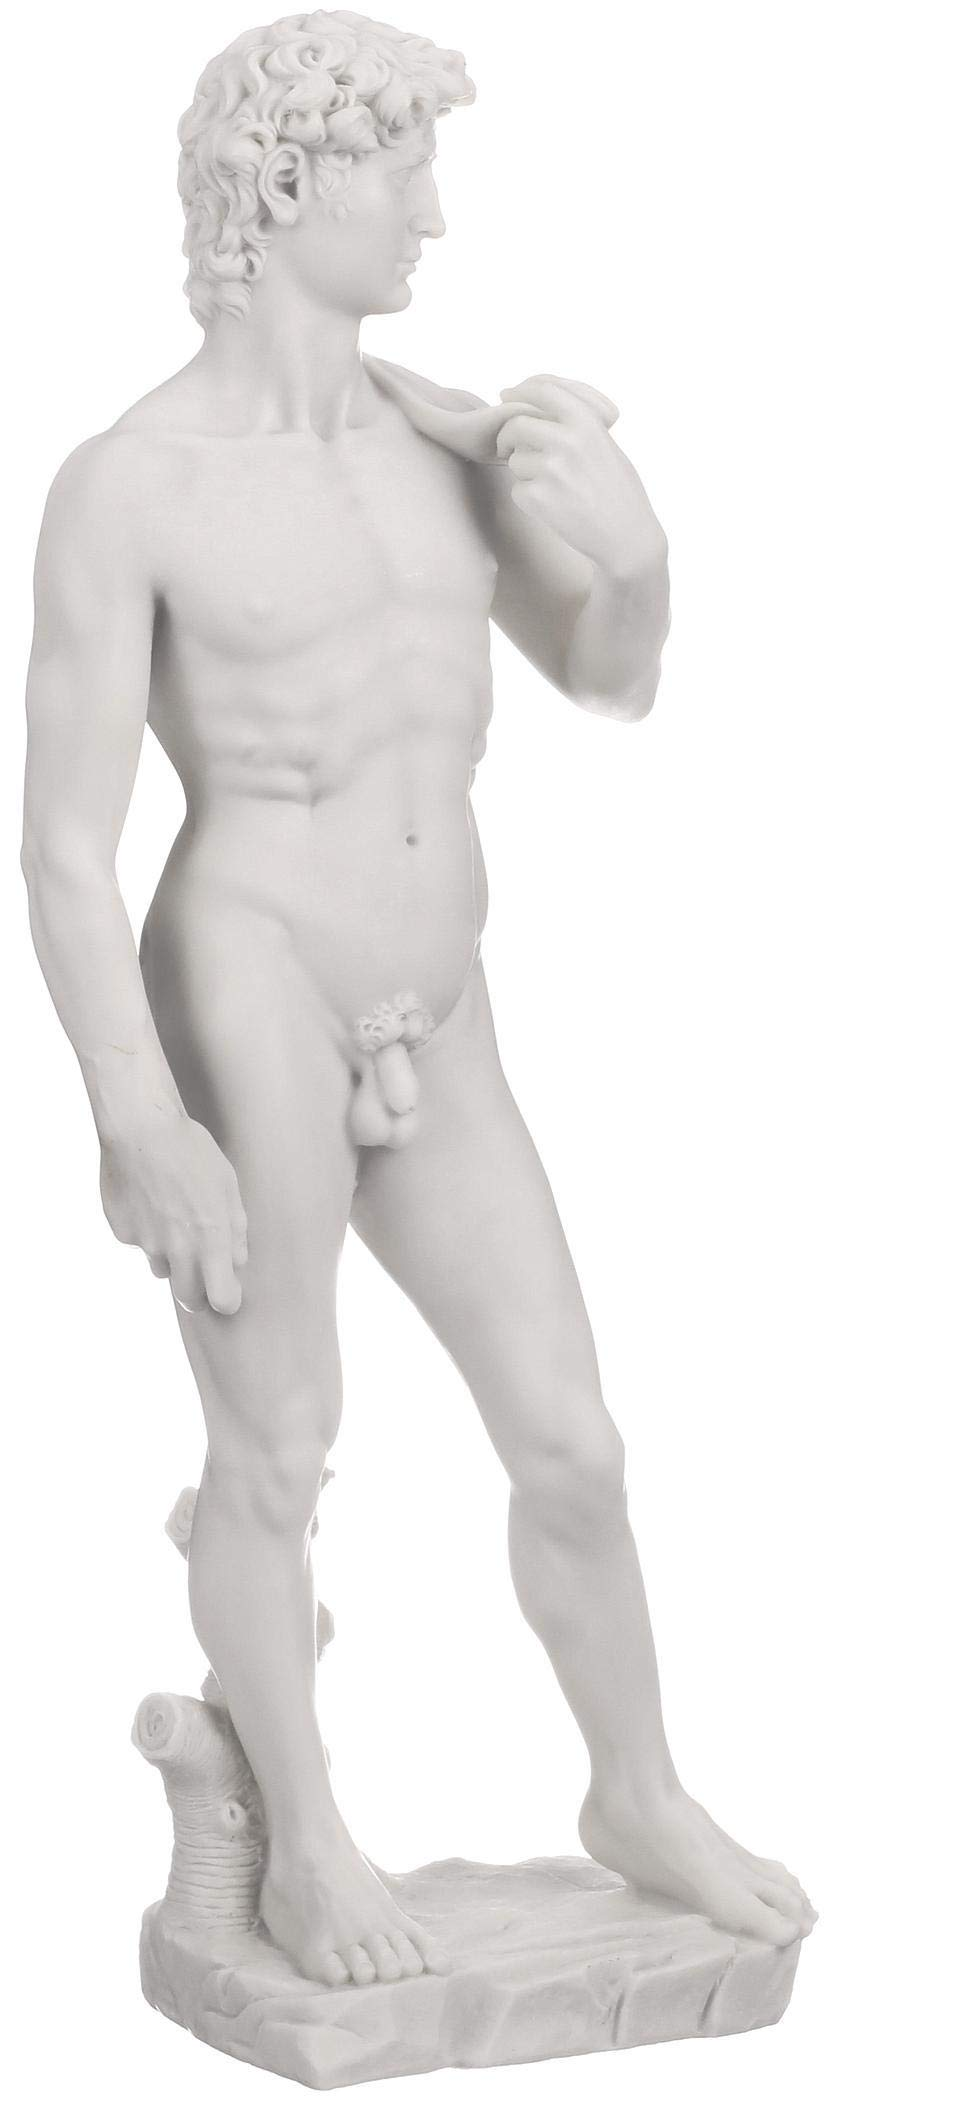 Design Toscano Michelangelo's David Statue, Medium, 19 Inch, Bonded Marble Polyresin, White